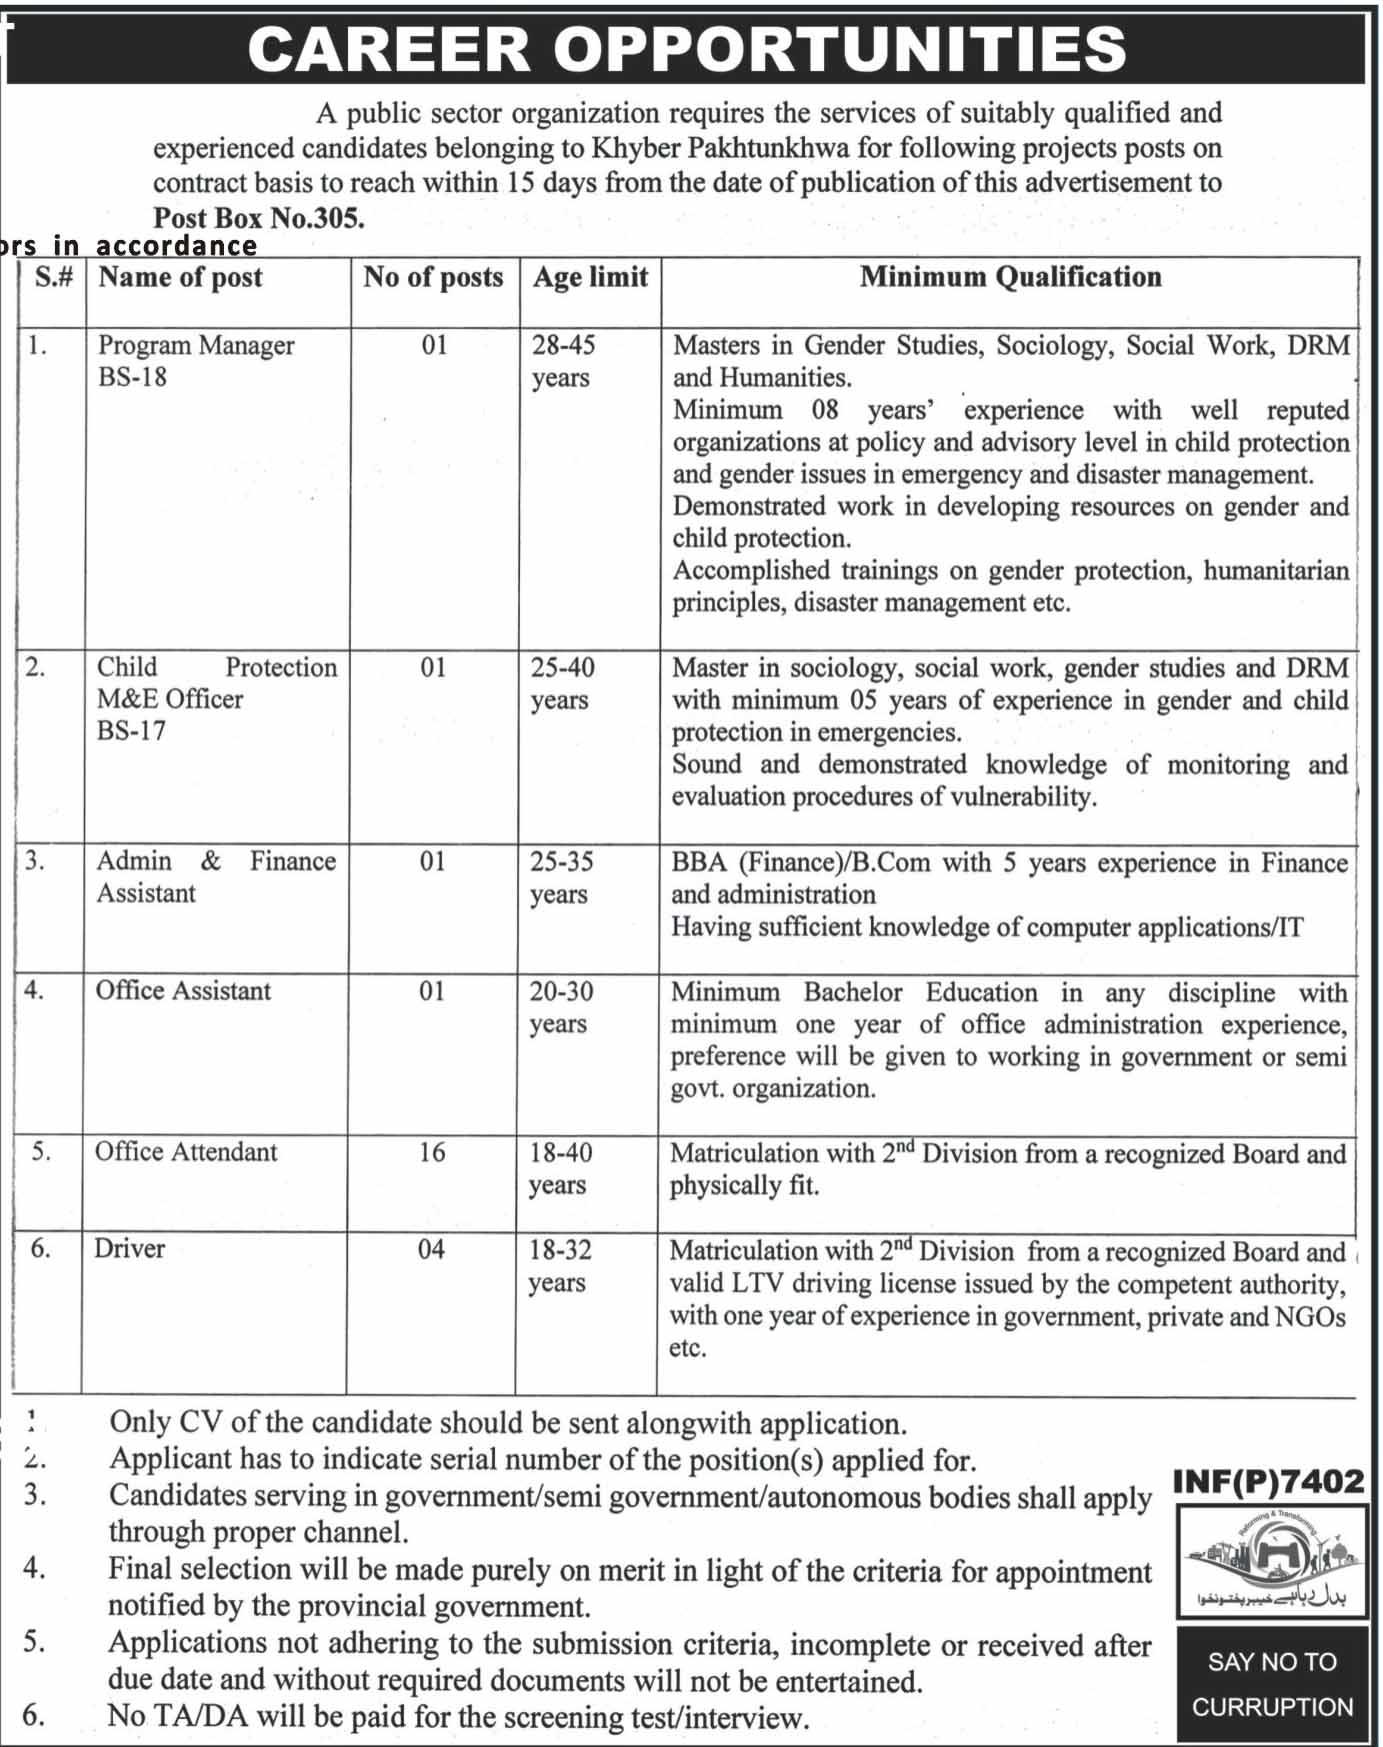 Khyber Pakhtunkhwa, Publice Sector Organization 24 Jobs 02 January 2018 Daily Mashriq Newspaper.